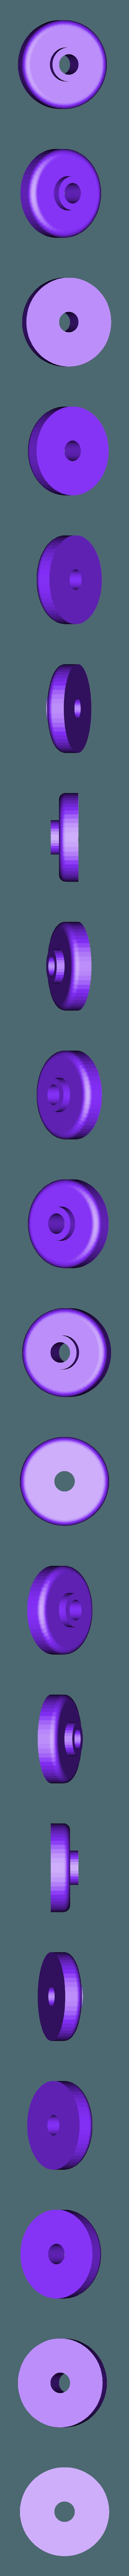 A-M2 (I).stl Download free STL file  VMO MASK V3 - 3D-PRINTED PROTECTIVE- Coronavirus COVID-19 (Improved Version) • Model to 3D print, victorottati